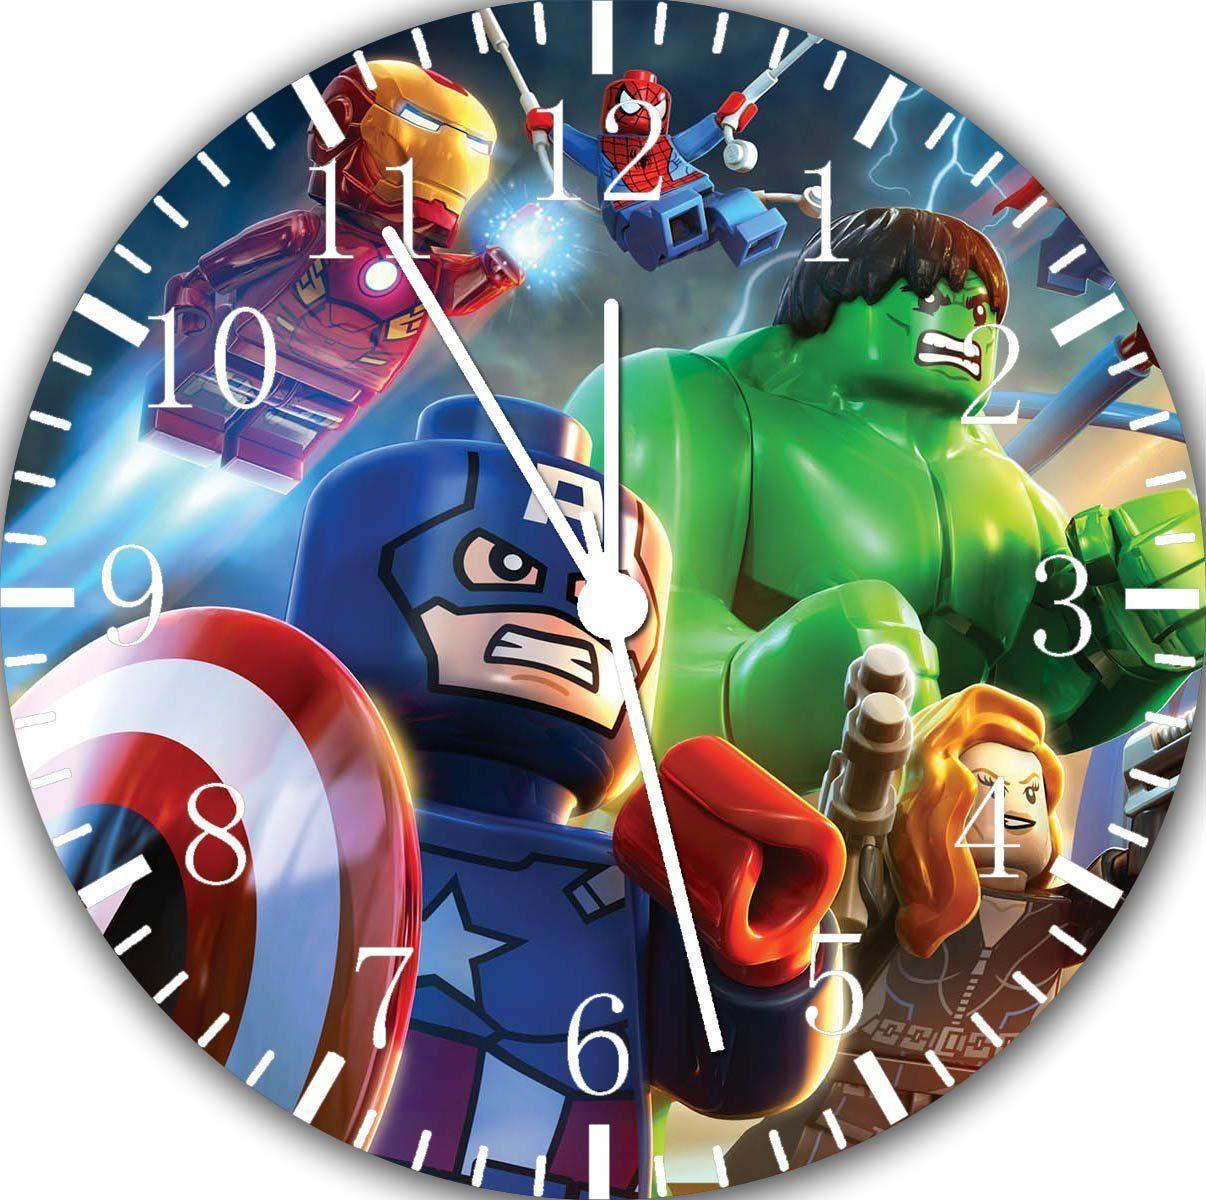 Lego super hero avengers hulk wall clock 10 will be nice gift and lego super hero avengers hulk wall clock 10 will be nice gift and room wall amipublicfo Images